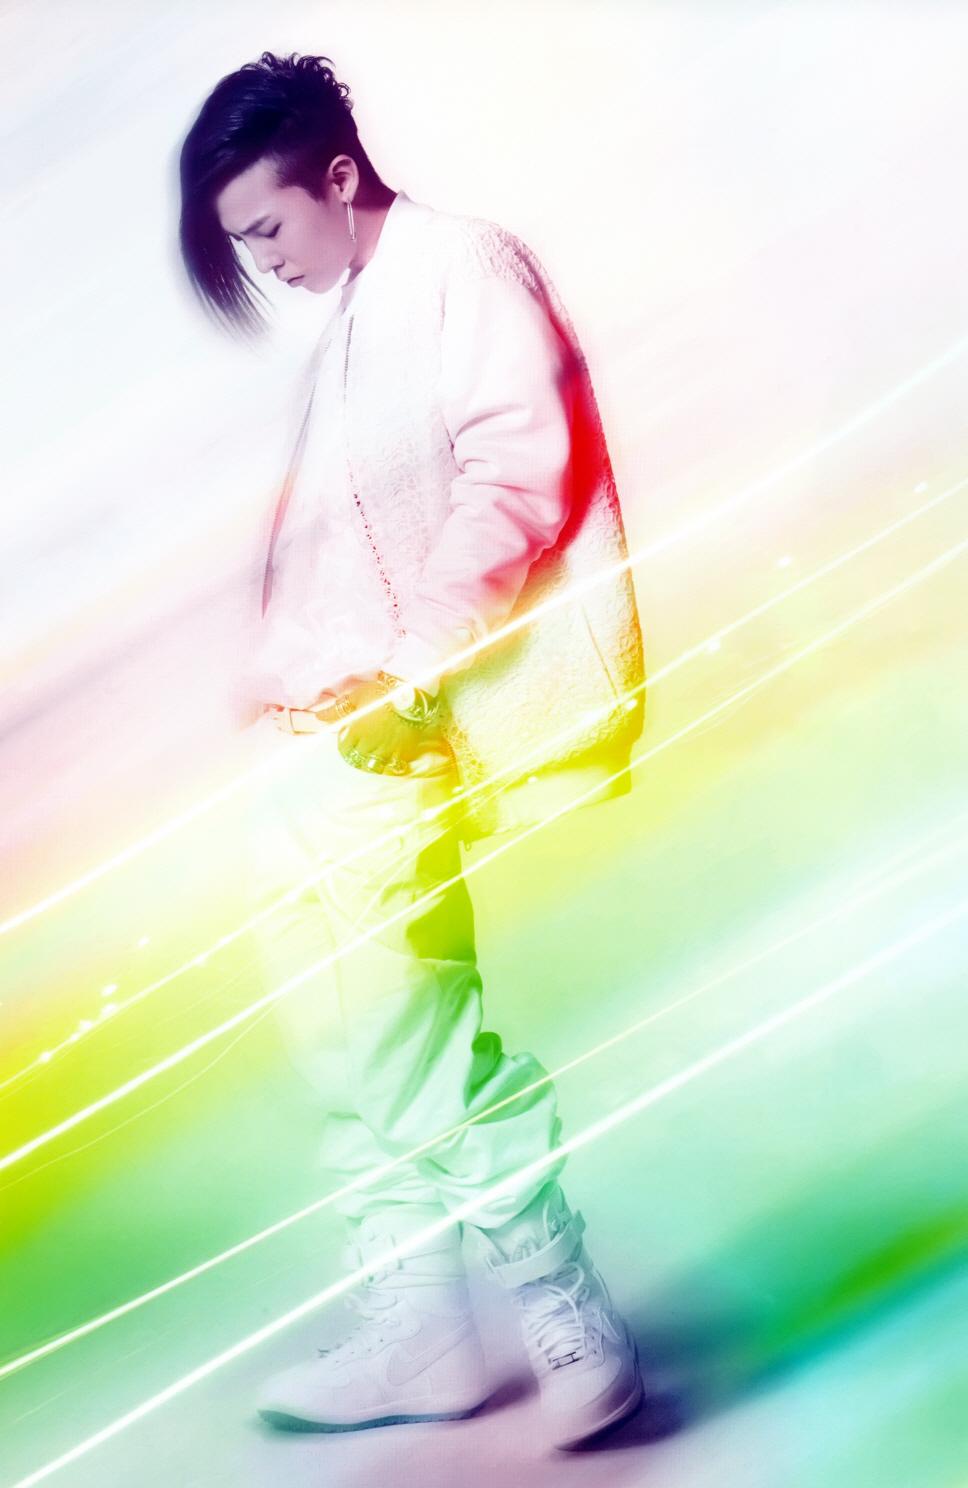 G-Dragon  Photos - Page 2 Bigbangupdates+GDRAGON+Alive+Scans_010